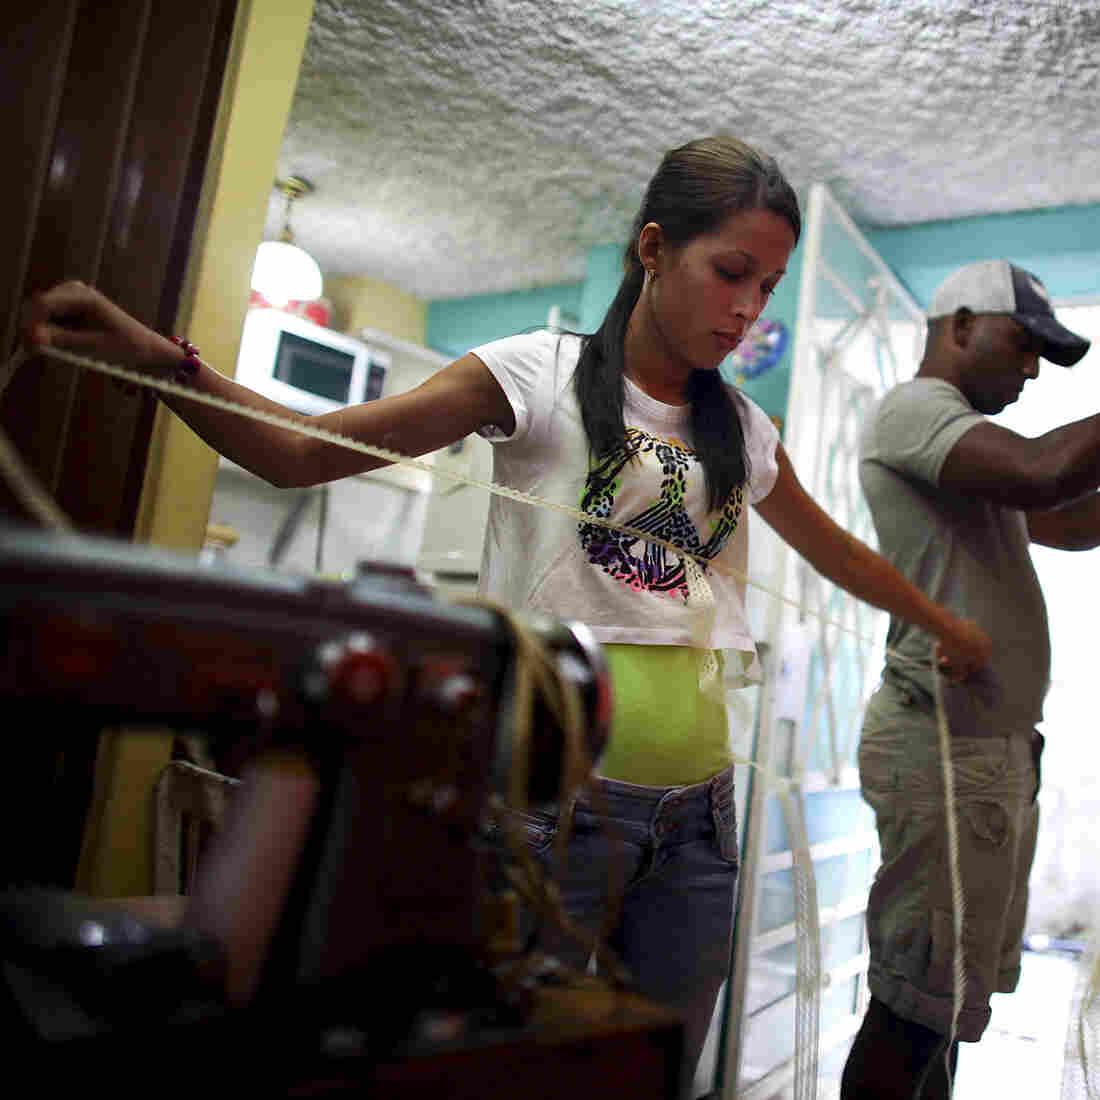 Cuba's Budding Entrepreneurs Travel A Rocky Road Toward Success